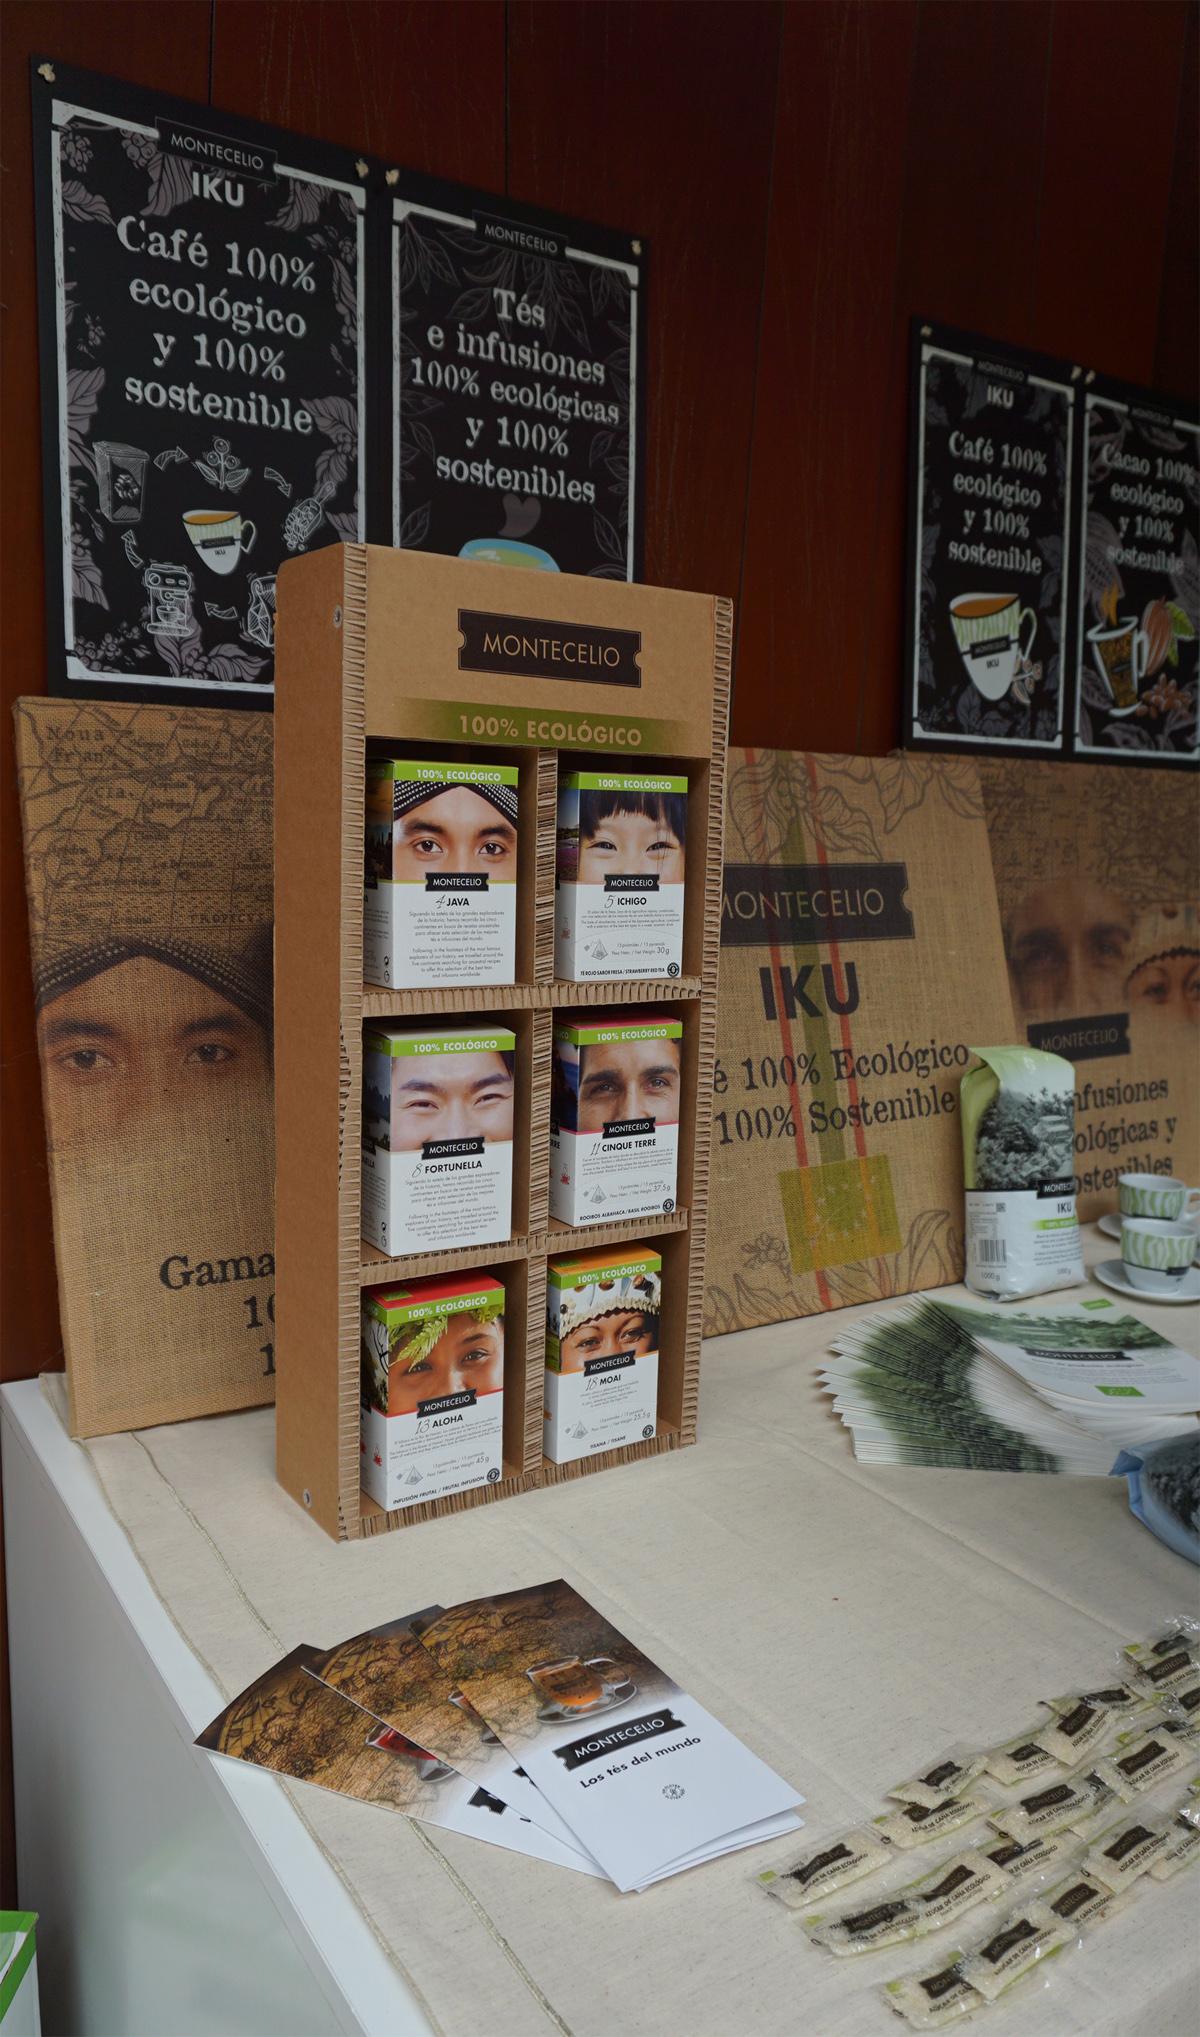 Iku de Cafés Montecelio